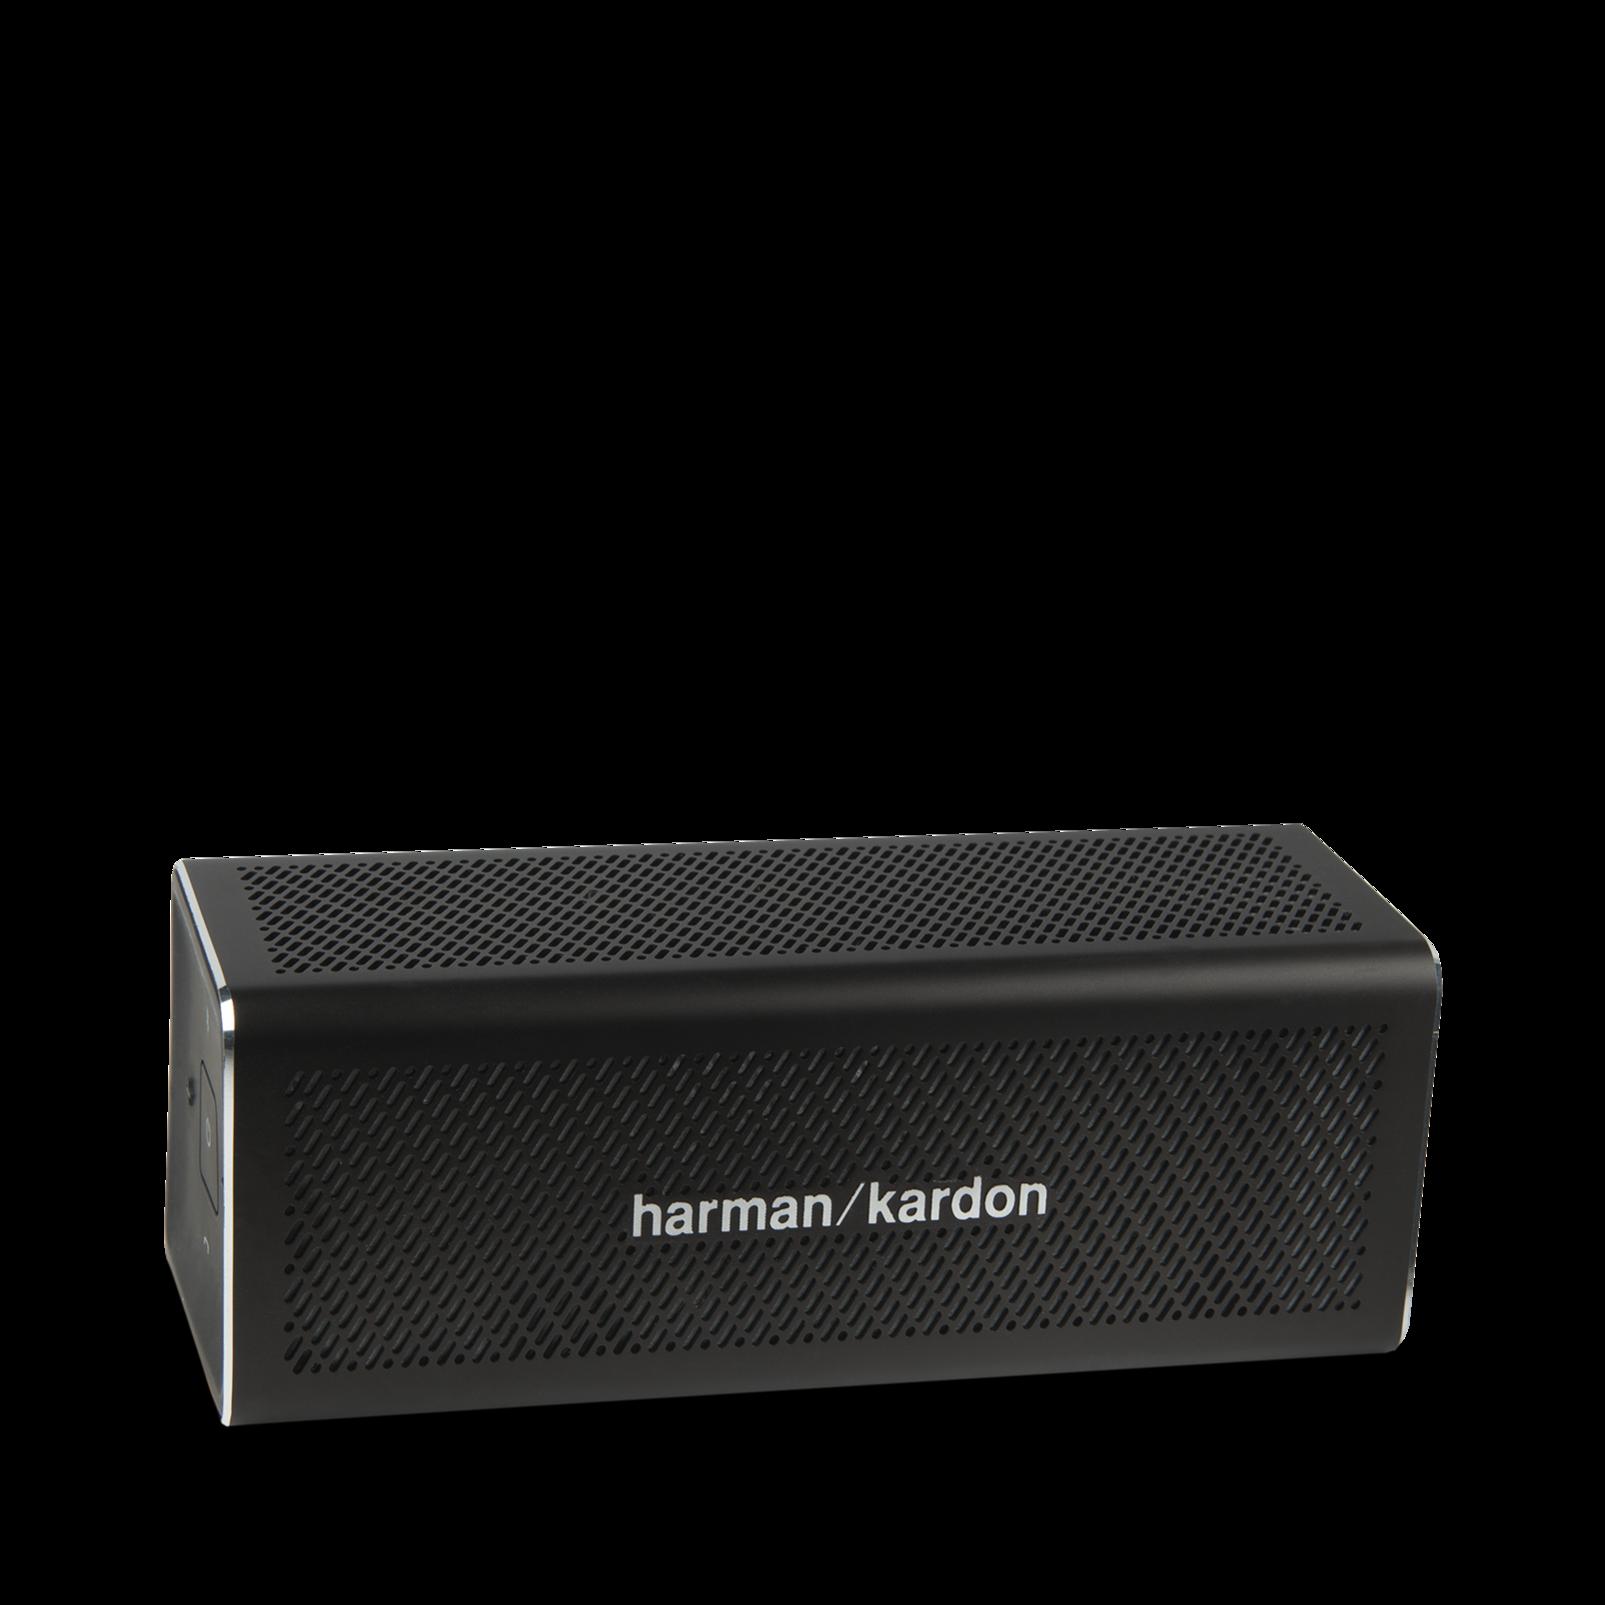 HK One - Black - Portable Bluetooth Speaker - Detailshot 2